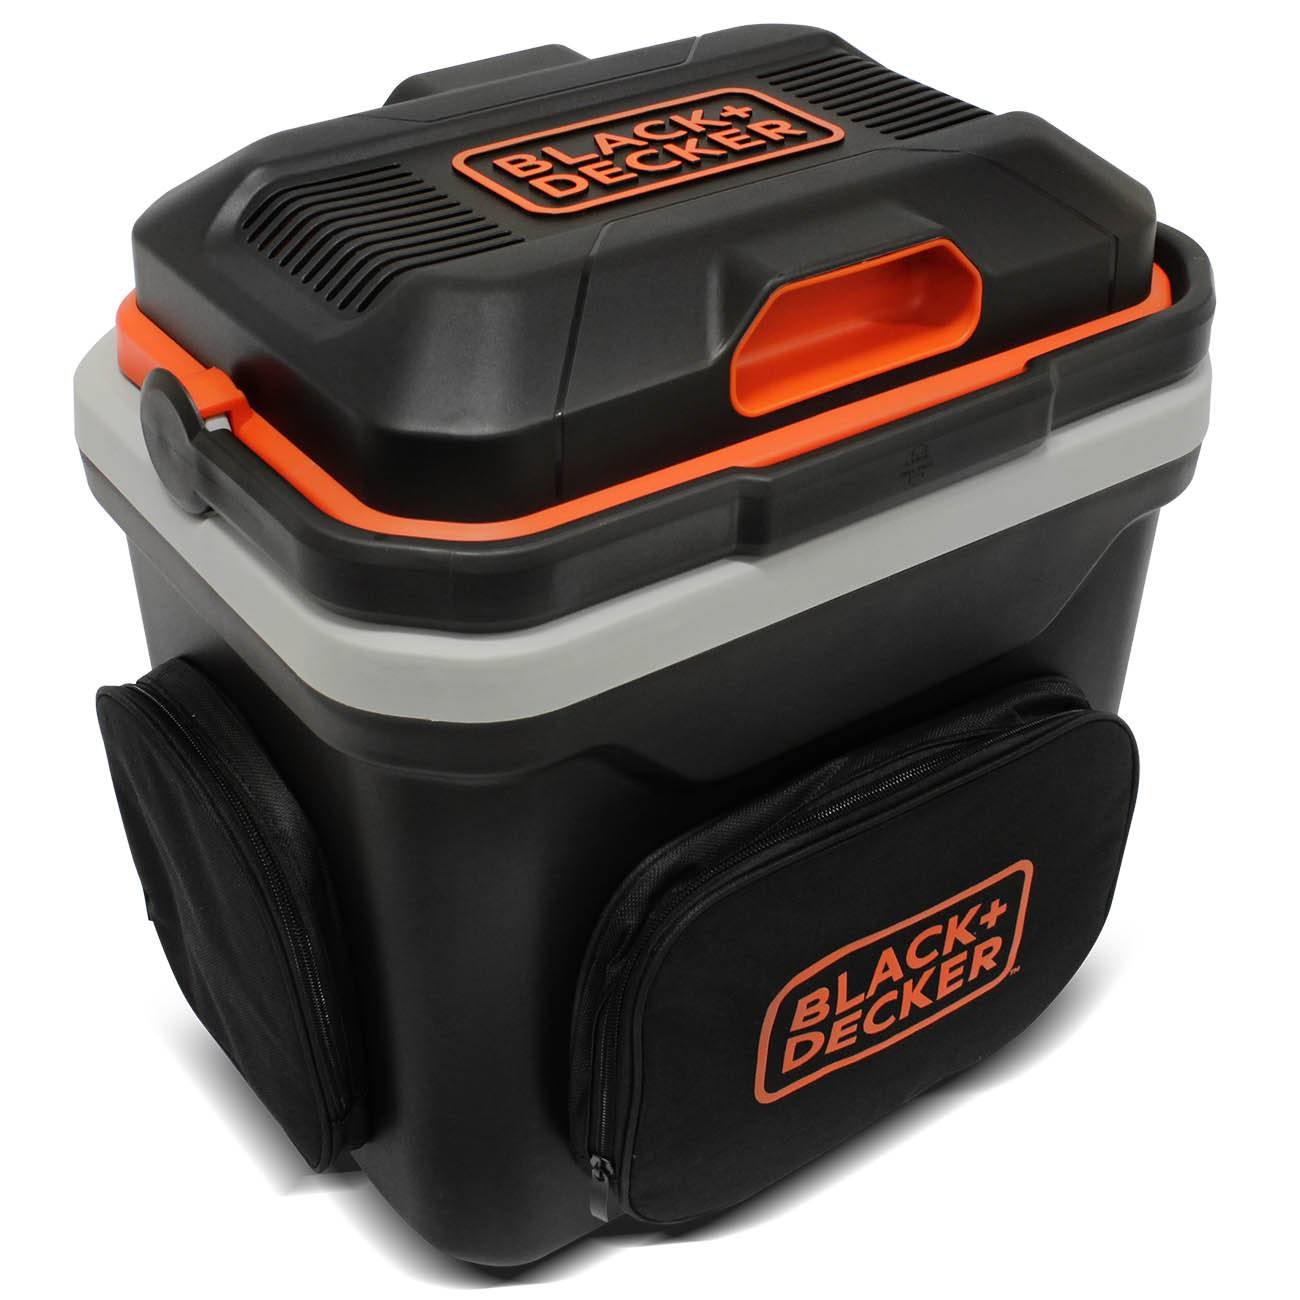 Mini Geladeira Portátil Black+Decker Termoelétrica 24 L 12V Refrigera Aquece Preto Laranja